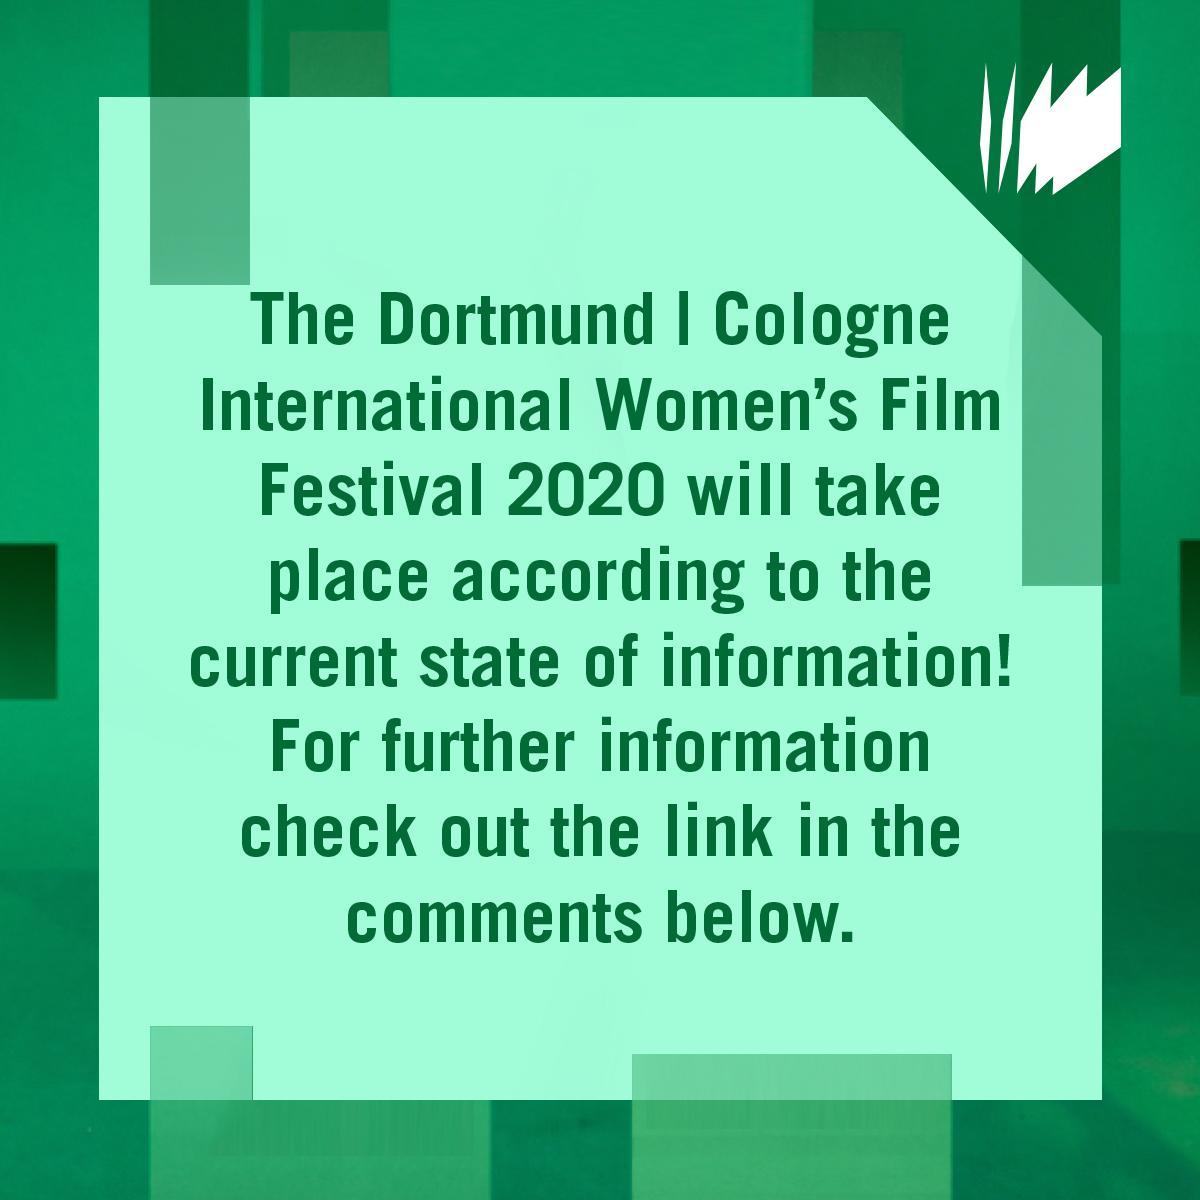 BOOM from Leyla Rodriguez @ the Köln 24.–29. März 2020 Internationales Frauenfilmfestival Dortmund Köln